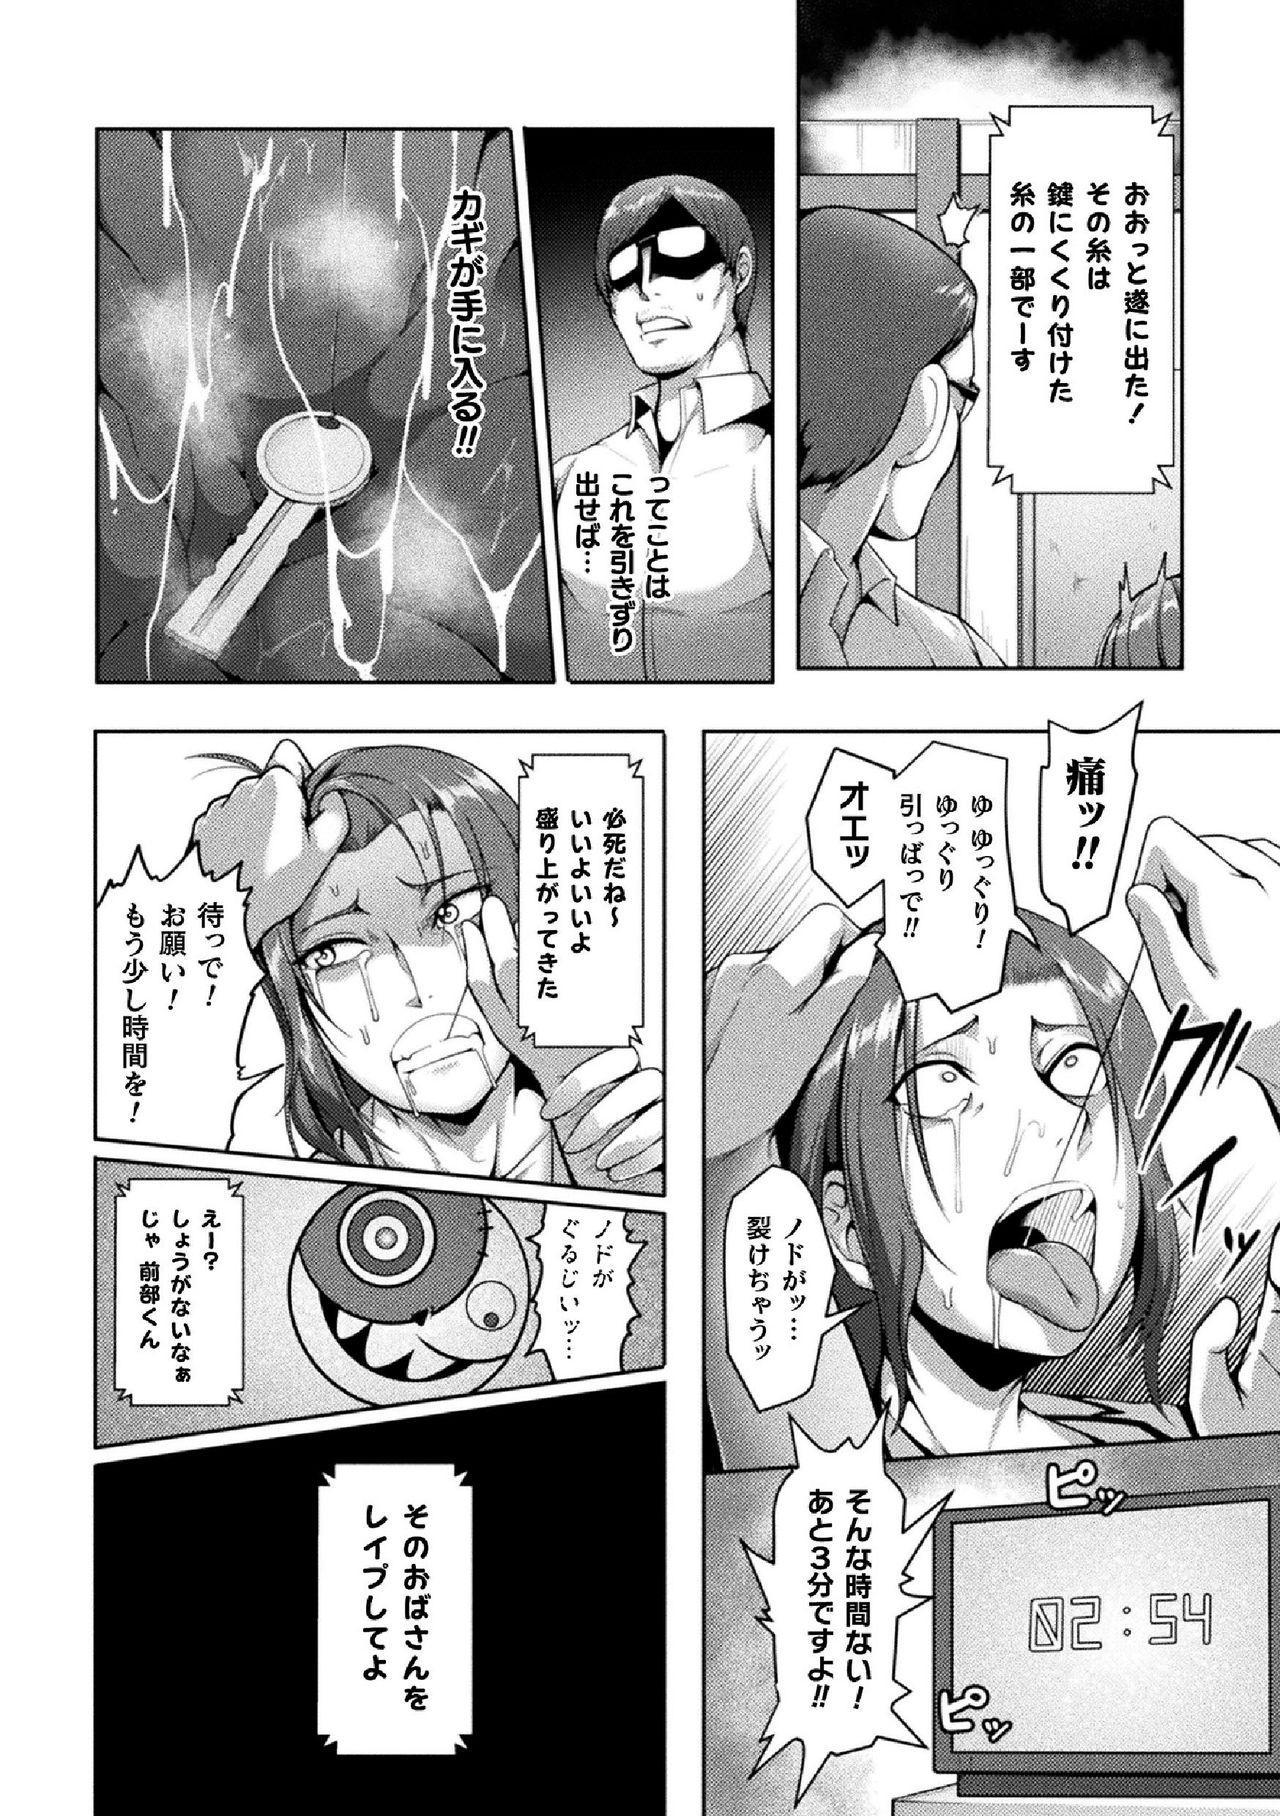 2D Comic Magazine Namaiki Onna ni HaraPun Seisai! Vol. 2 57